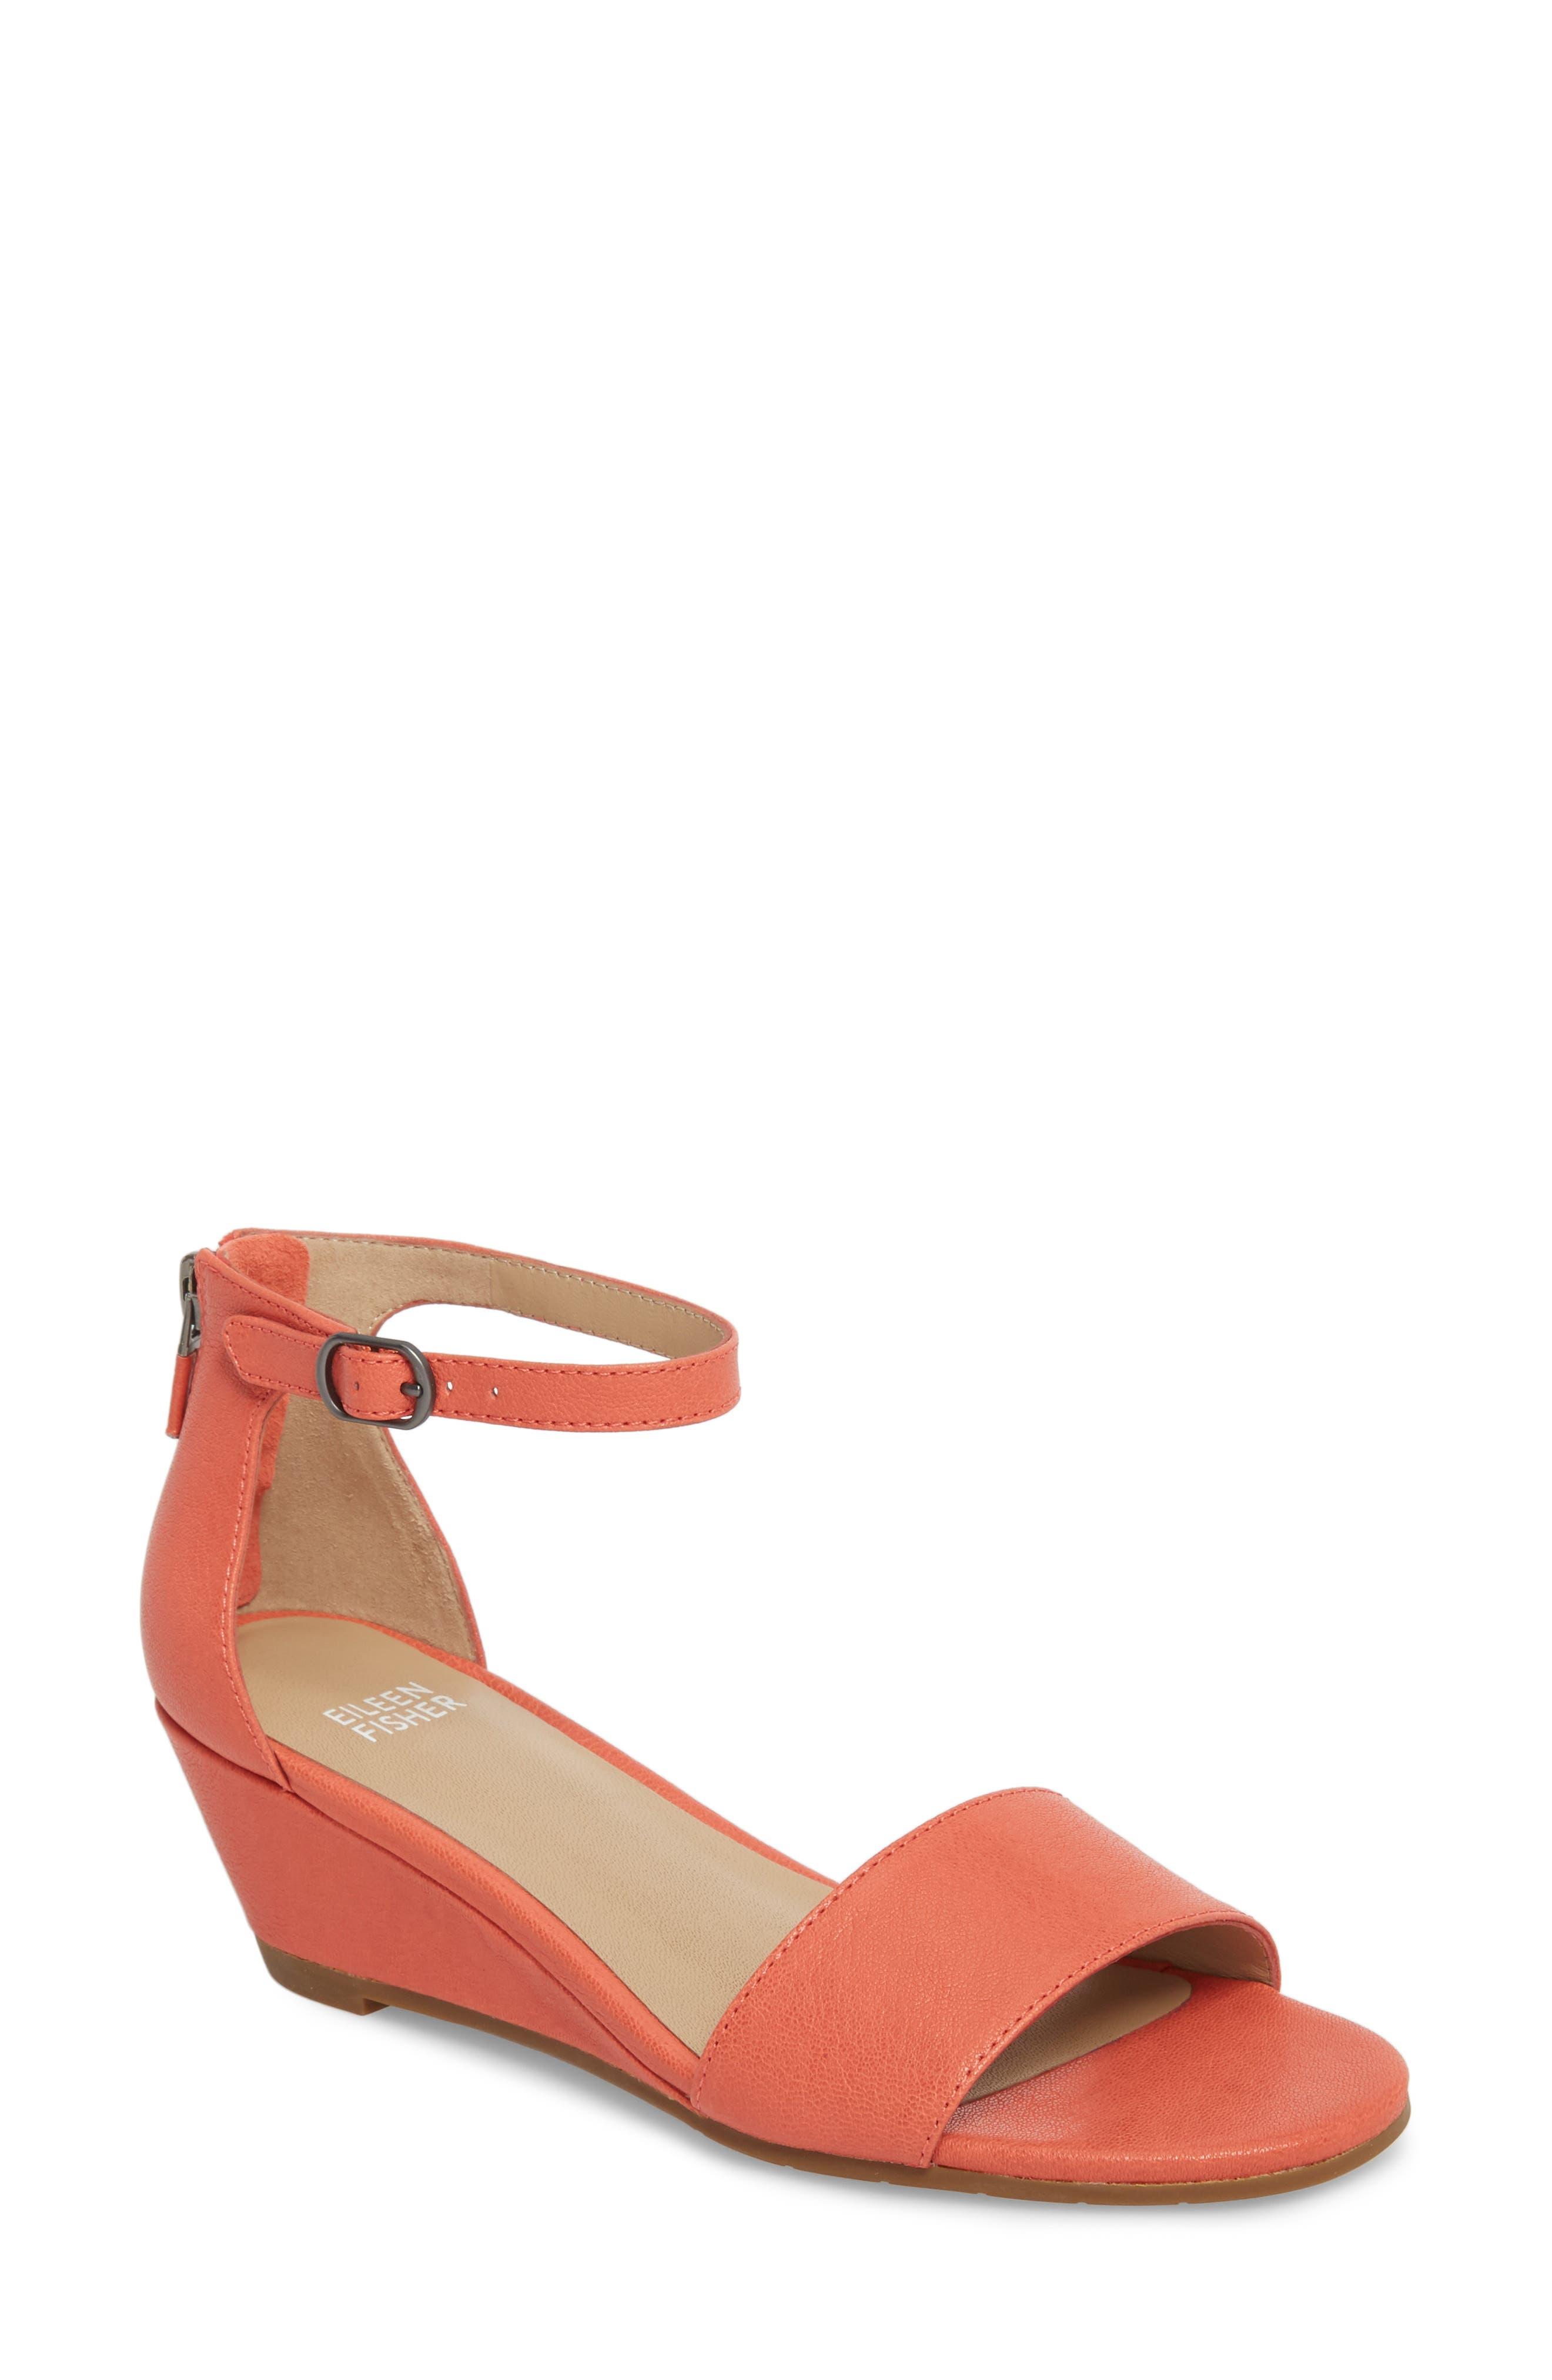 Mara Ankle Strap Wedge Sandal,                             Main thumbnail 4, color,